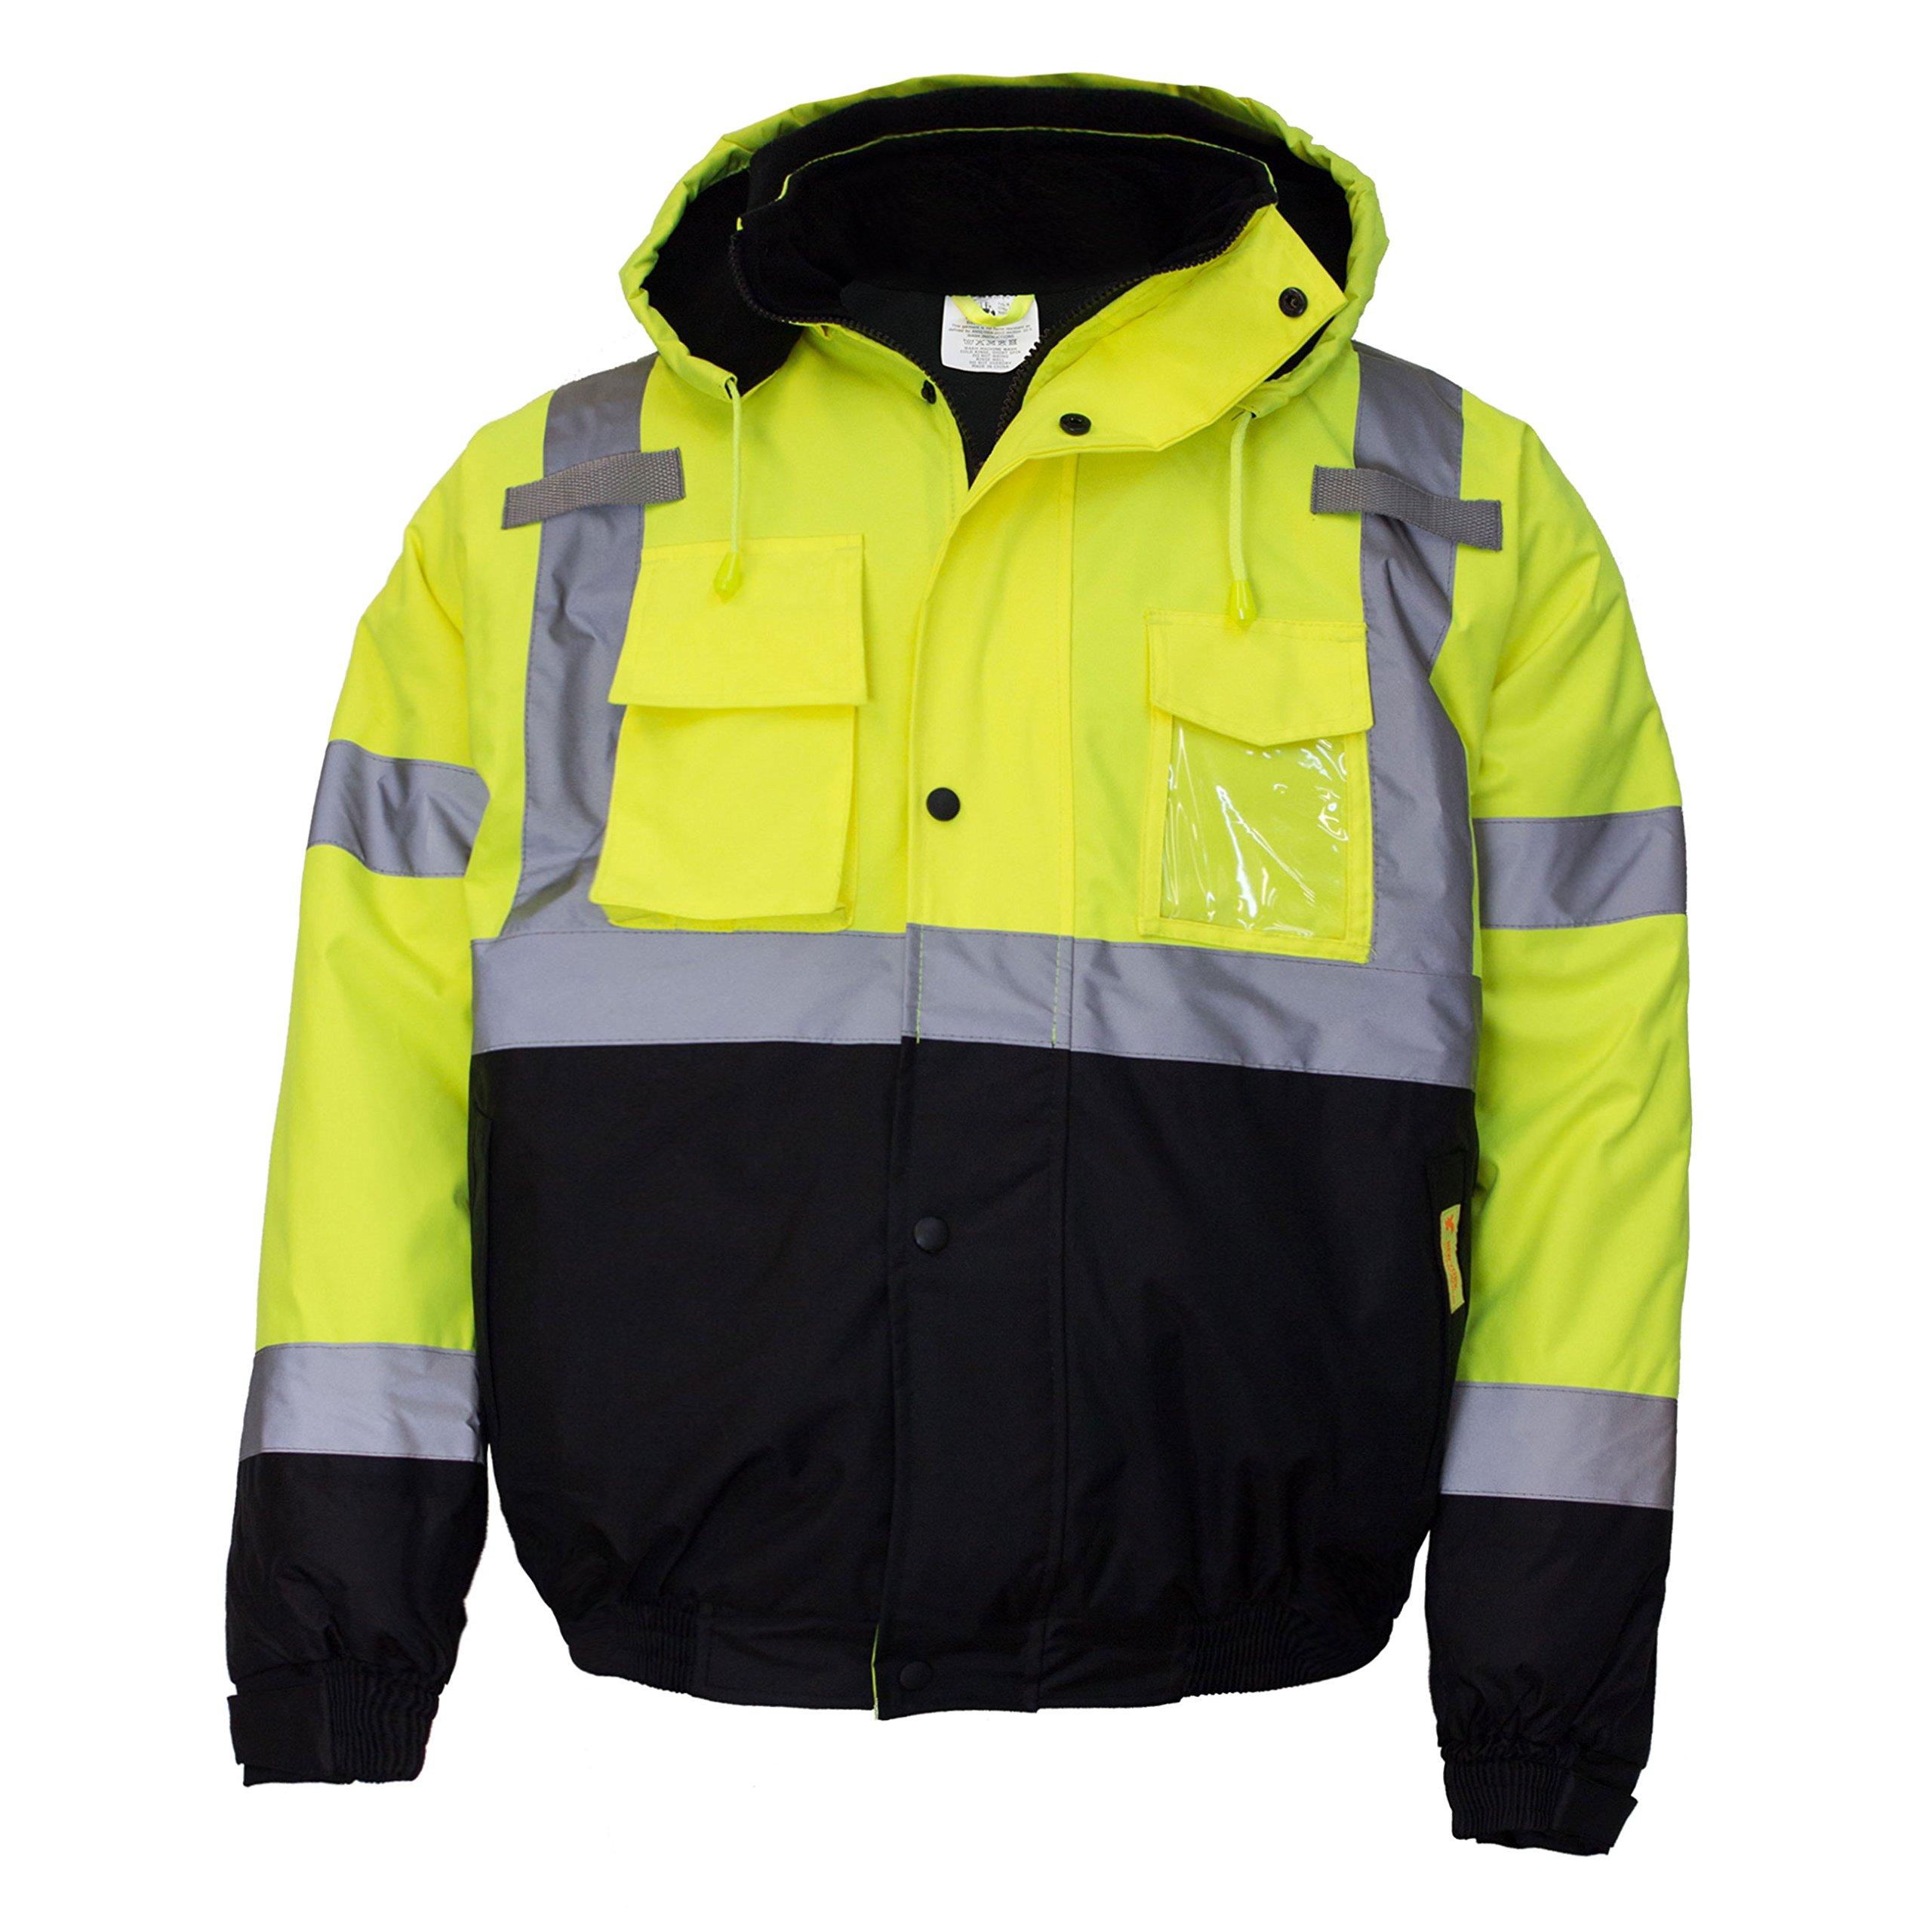 New York Hi-Viz Workwear WJ9012-L Men's ANSI Class 3 High Visibility Bomber Safety Jacket, Waterproof (Large, Lime) by New York Hi-Viz Workwear (Image #2)